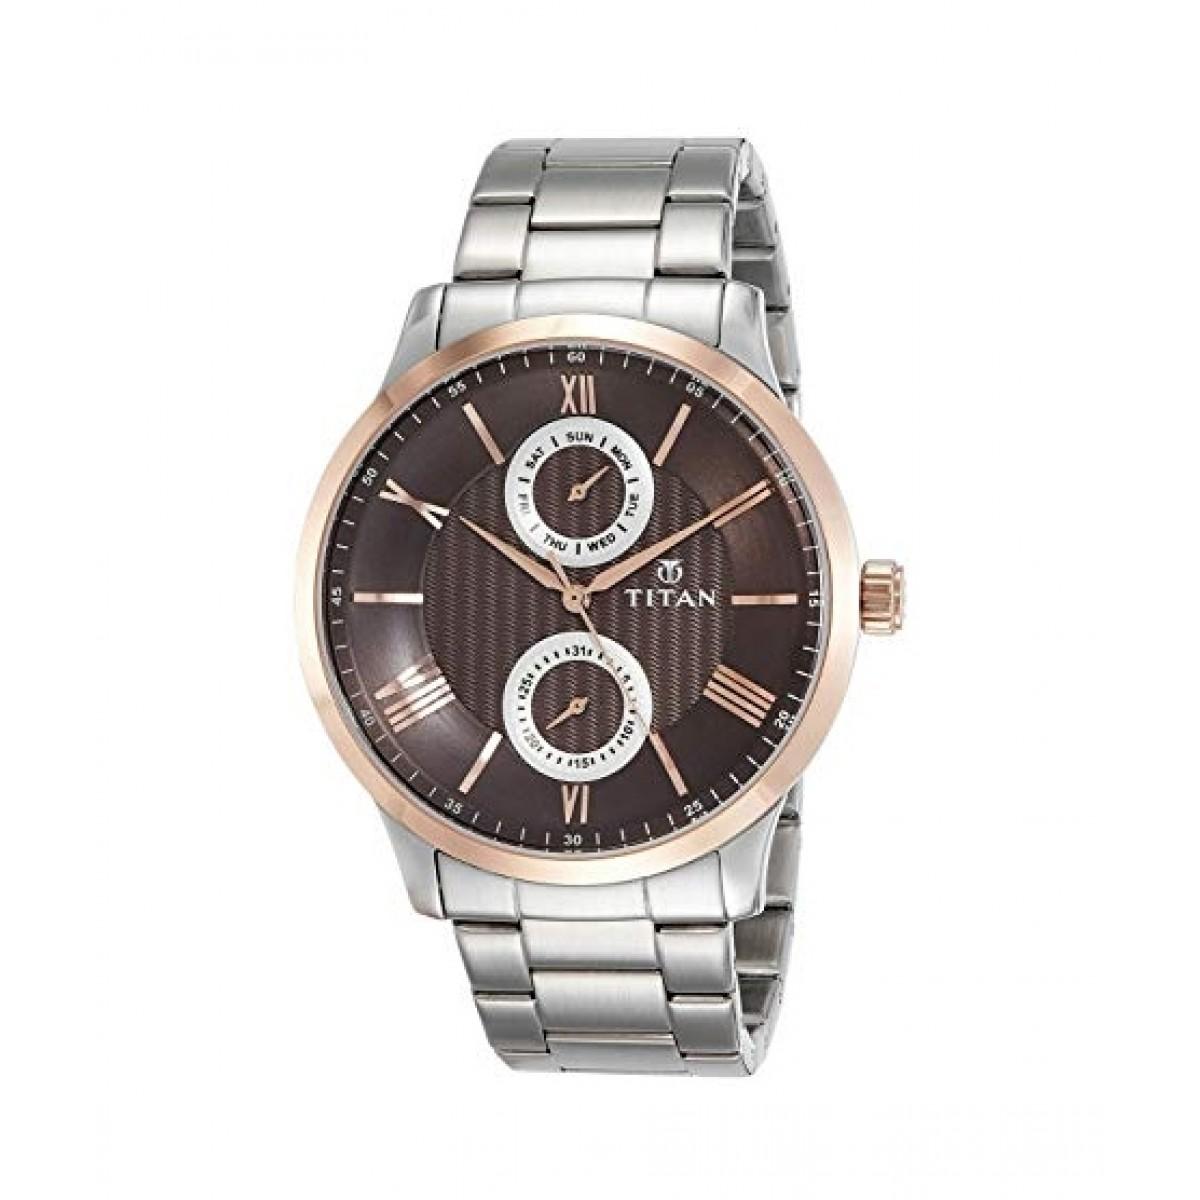 Titan Classique Men's Watch Silver (90100KM01)